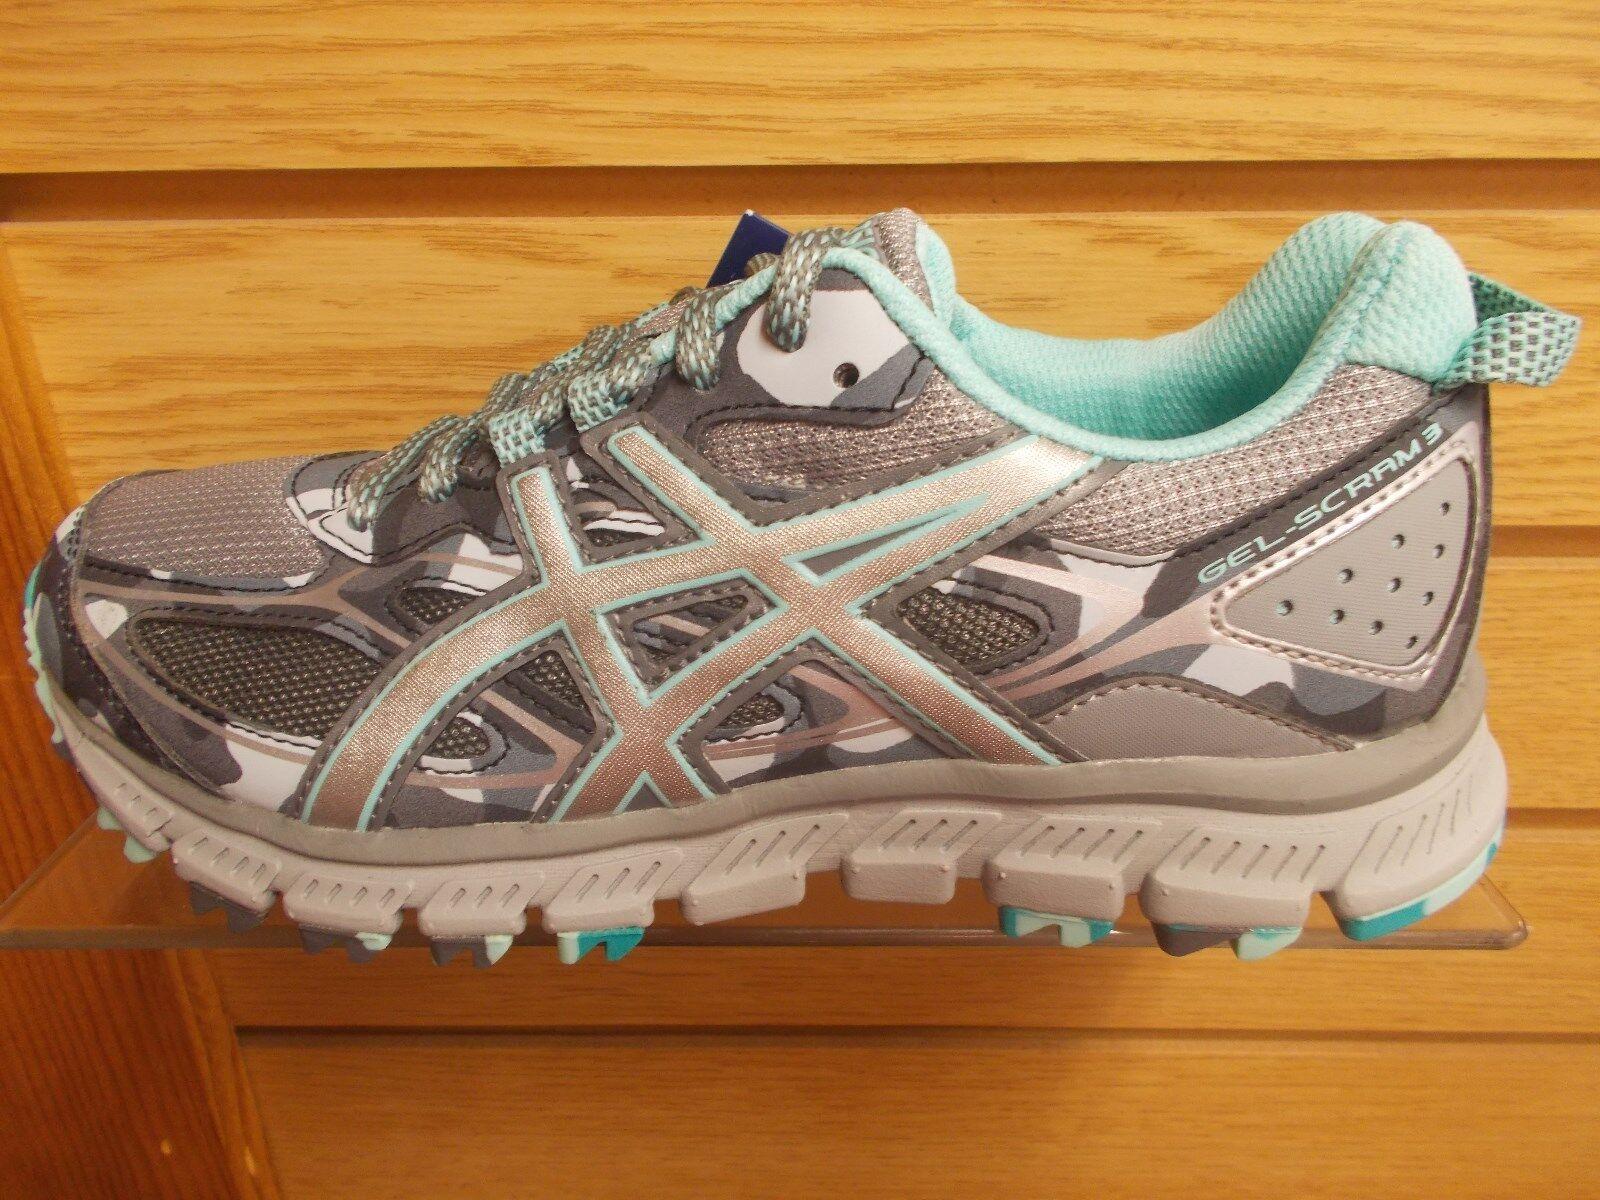 ASICS T6K7N WOMEN'S GEL SCRAM 3 GREY TRAIL RUNNING MEDIUM WIDTH  SHOE Cheap women's shoes women's shoes